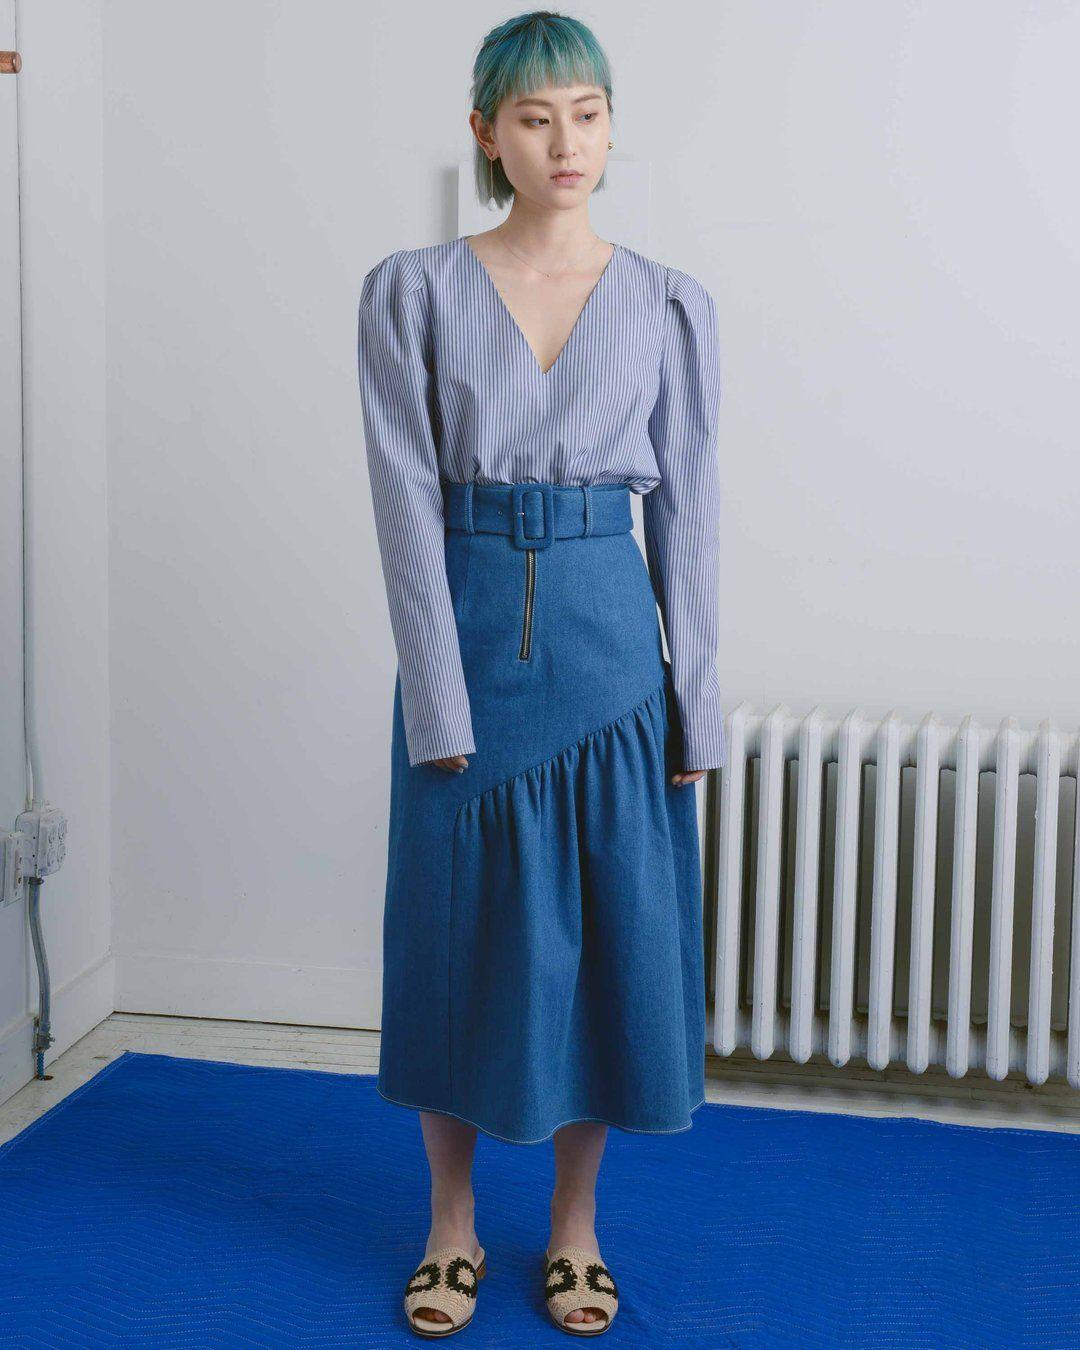 2b5b81cac6 Midi Denim Skirt Pinterest | Saddha